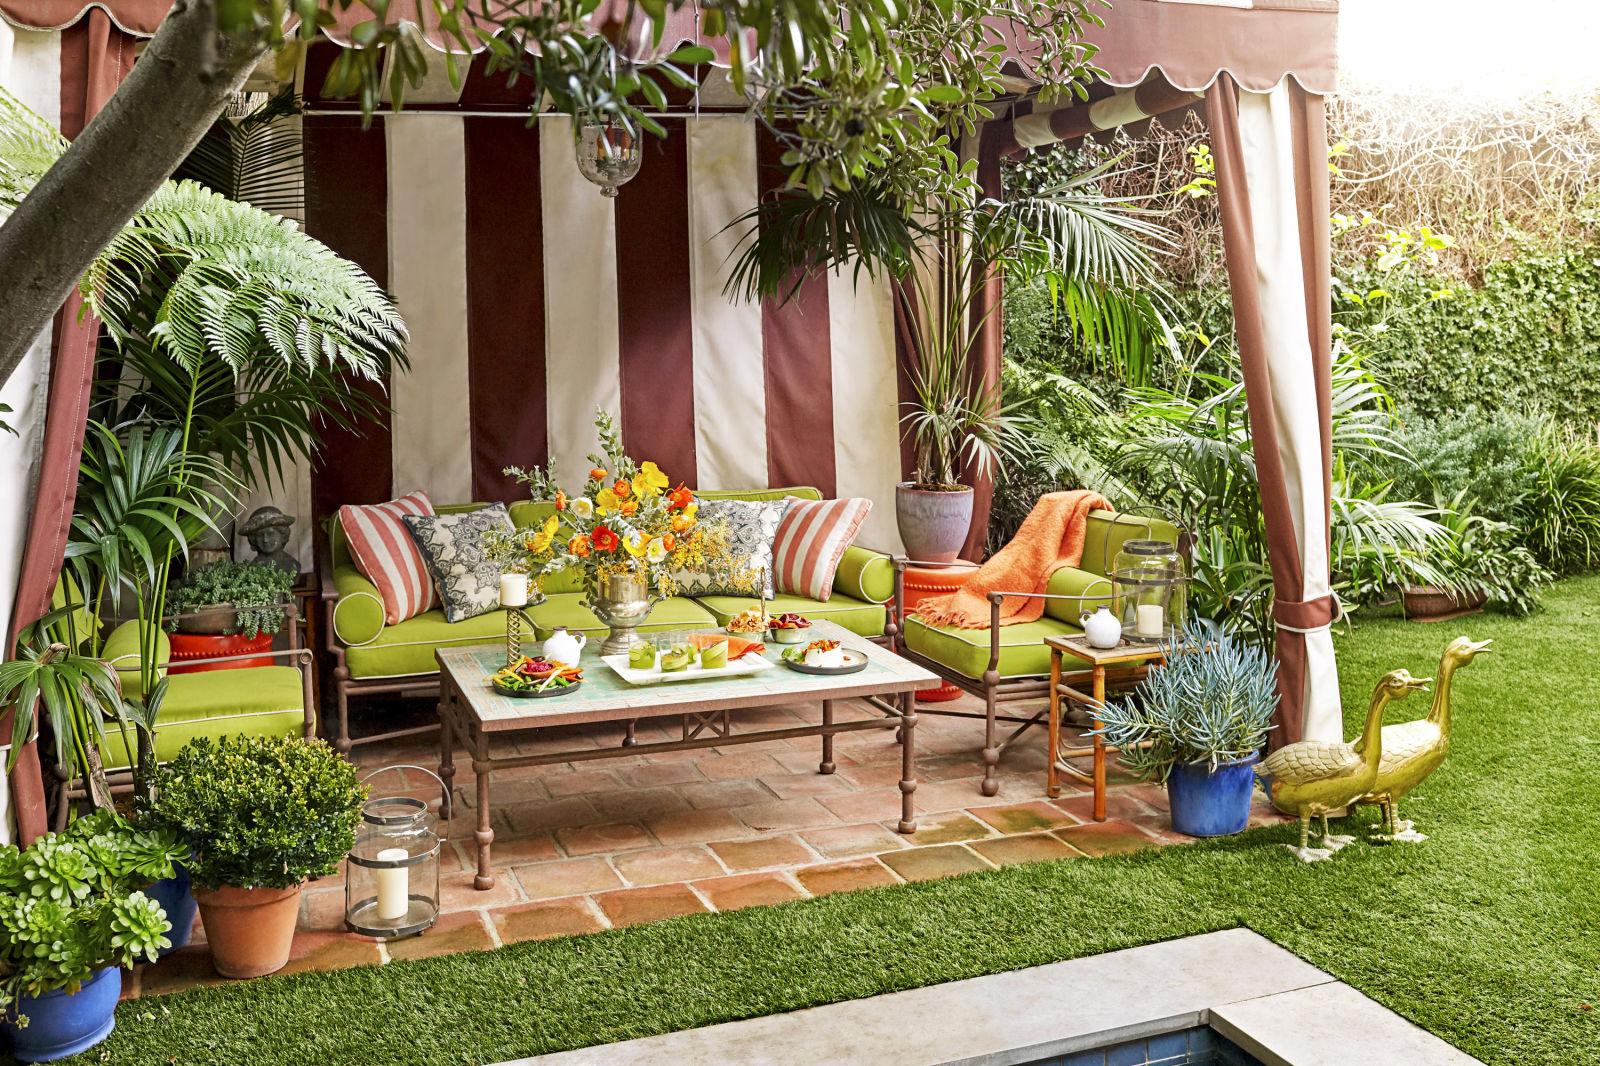 10 outdoor party ideas how to throw a backyard party - Gartenparty dekoration ...